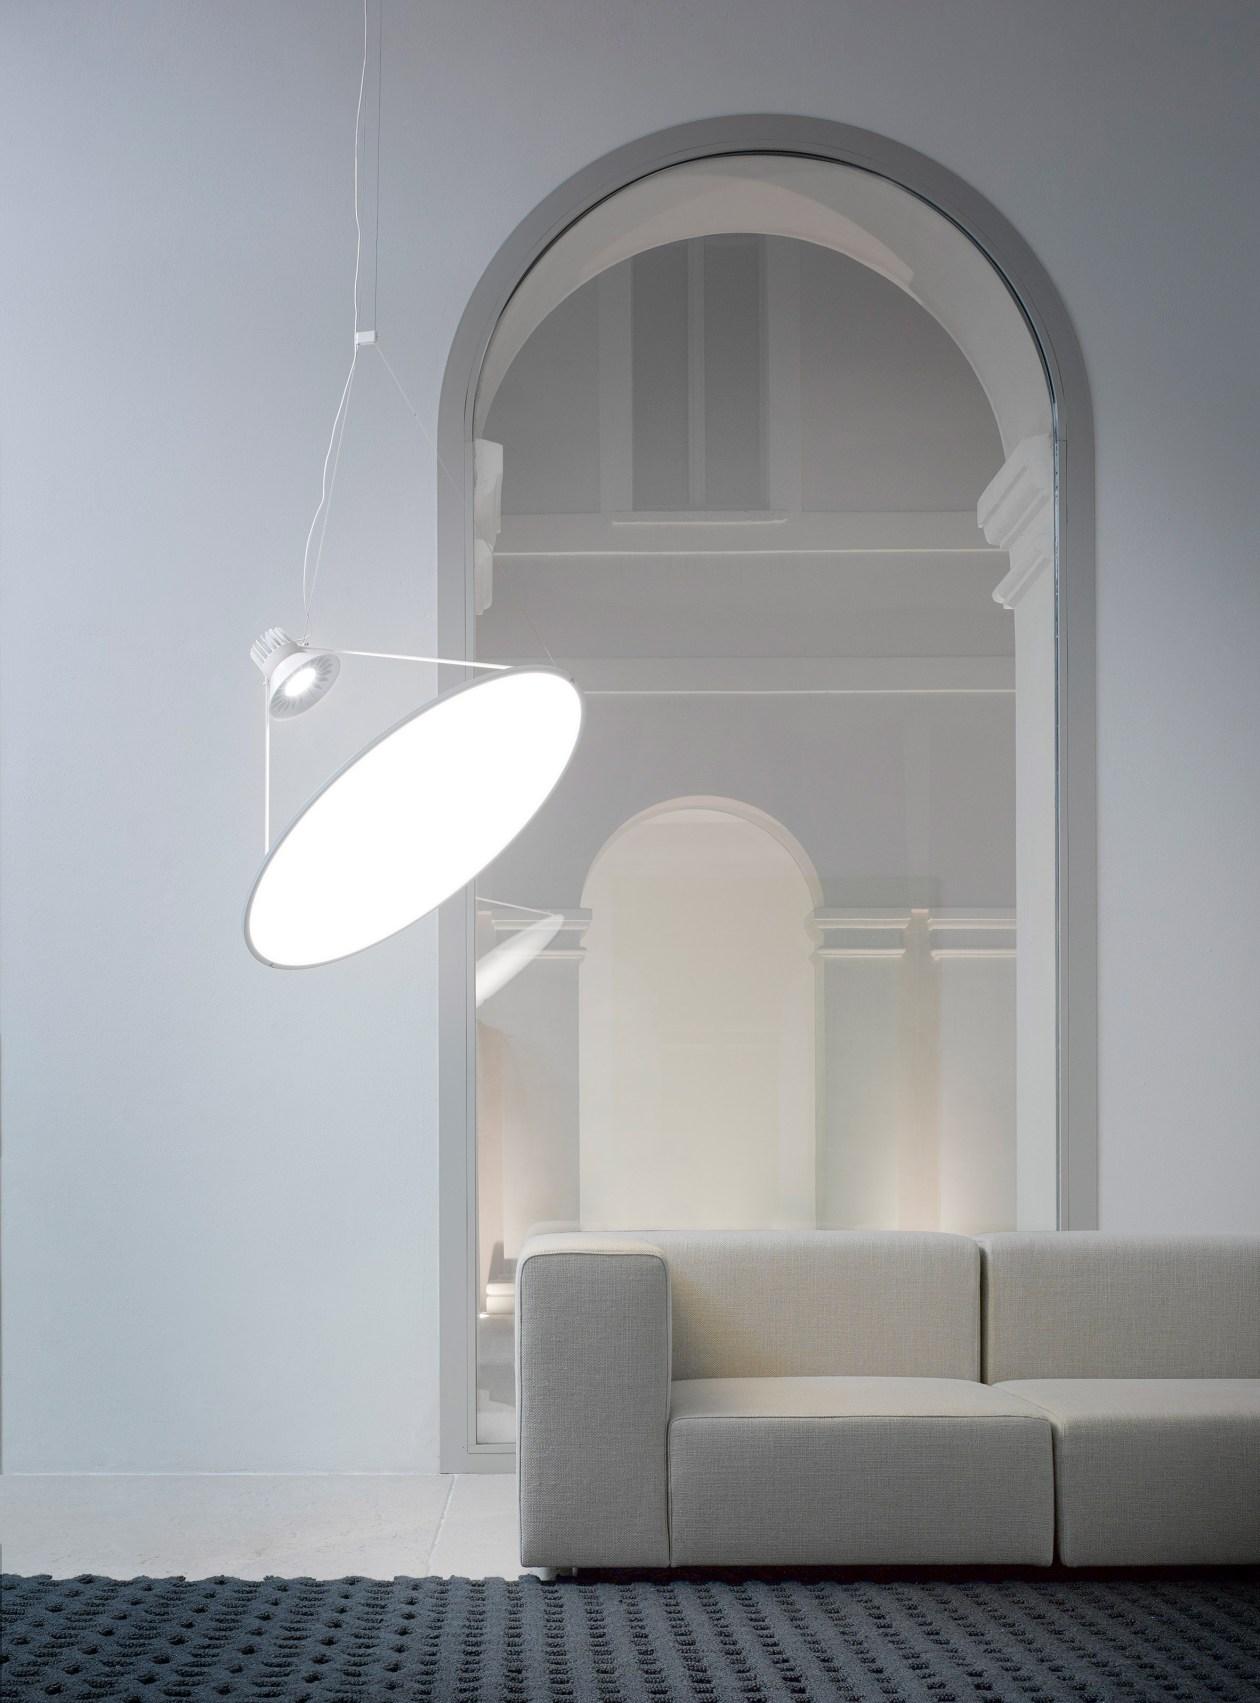 amisol-lamp-design_dezeen_2364_col_3.jpg